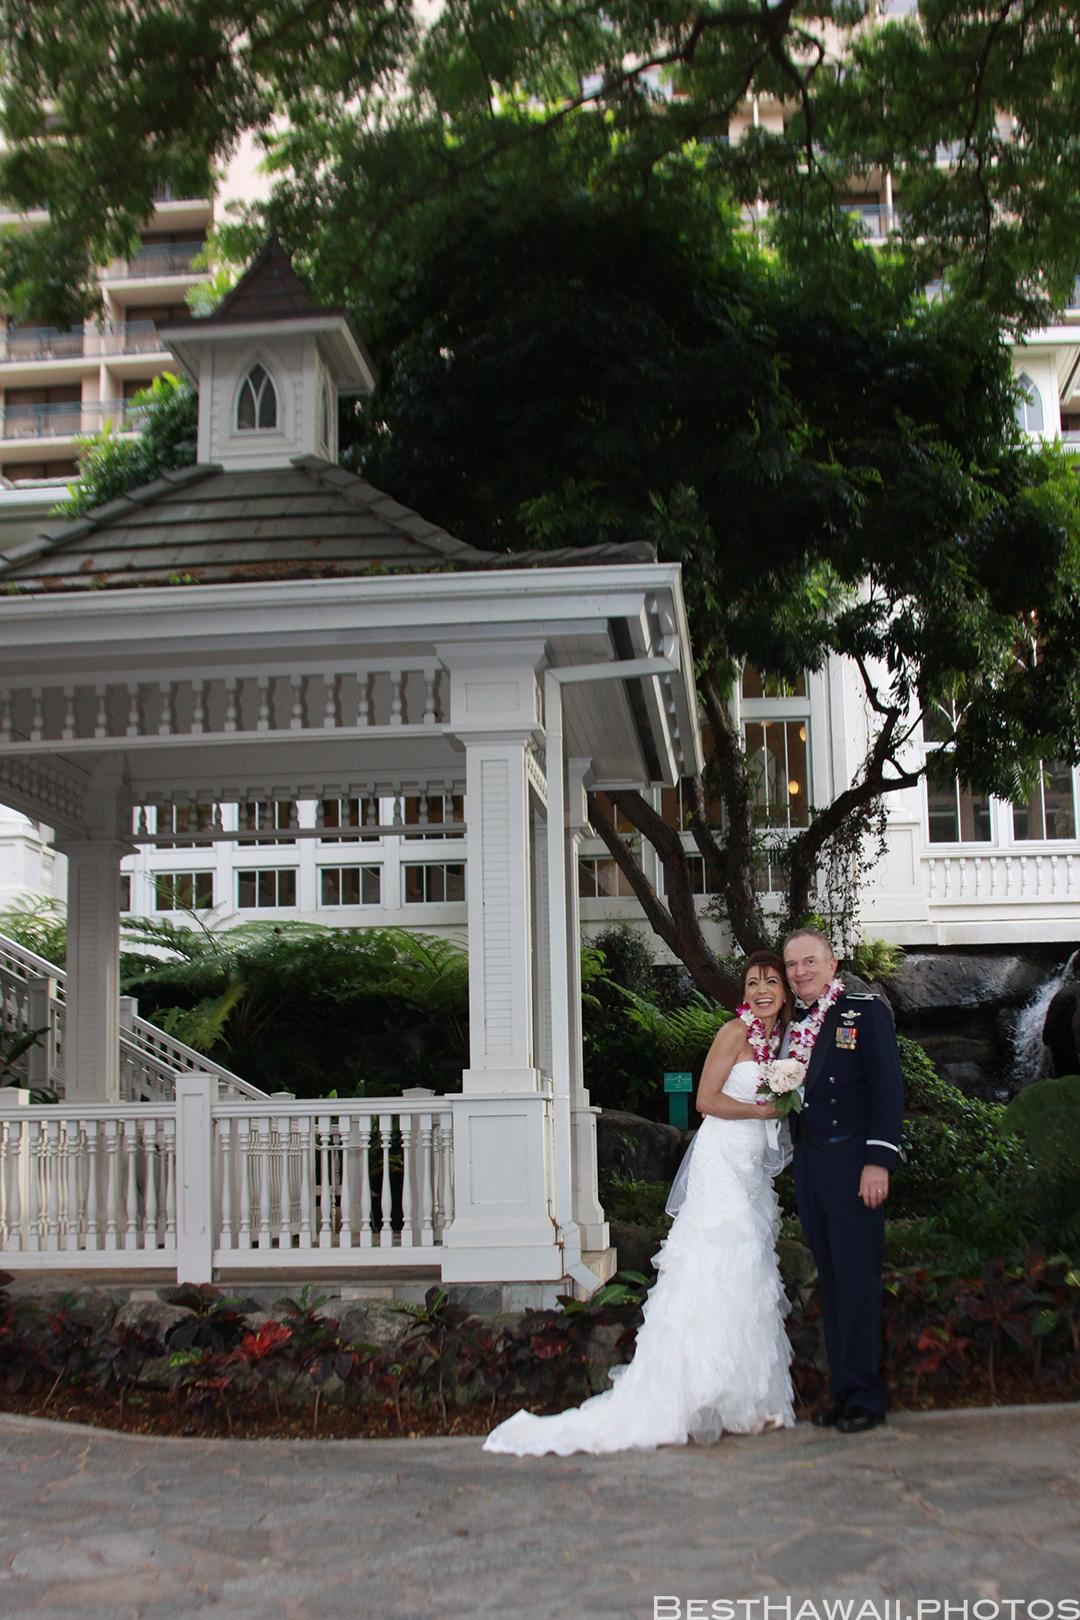 Wedding Photos at Hilton Hawaiian Village by Pasha www.BestHawaii.photos 121820158664